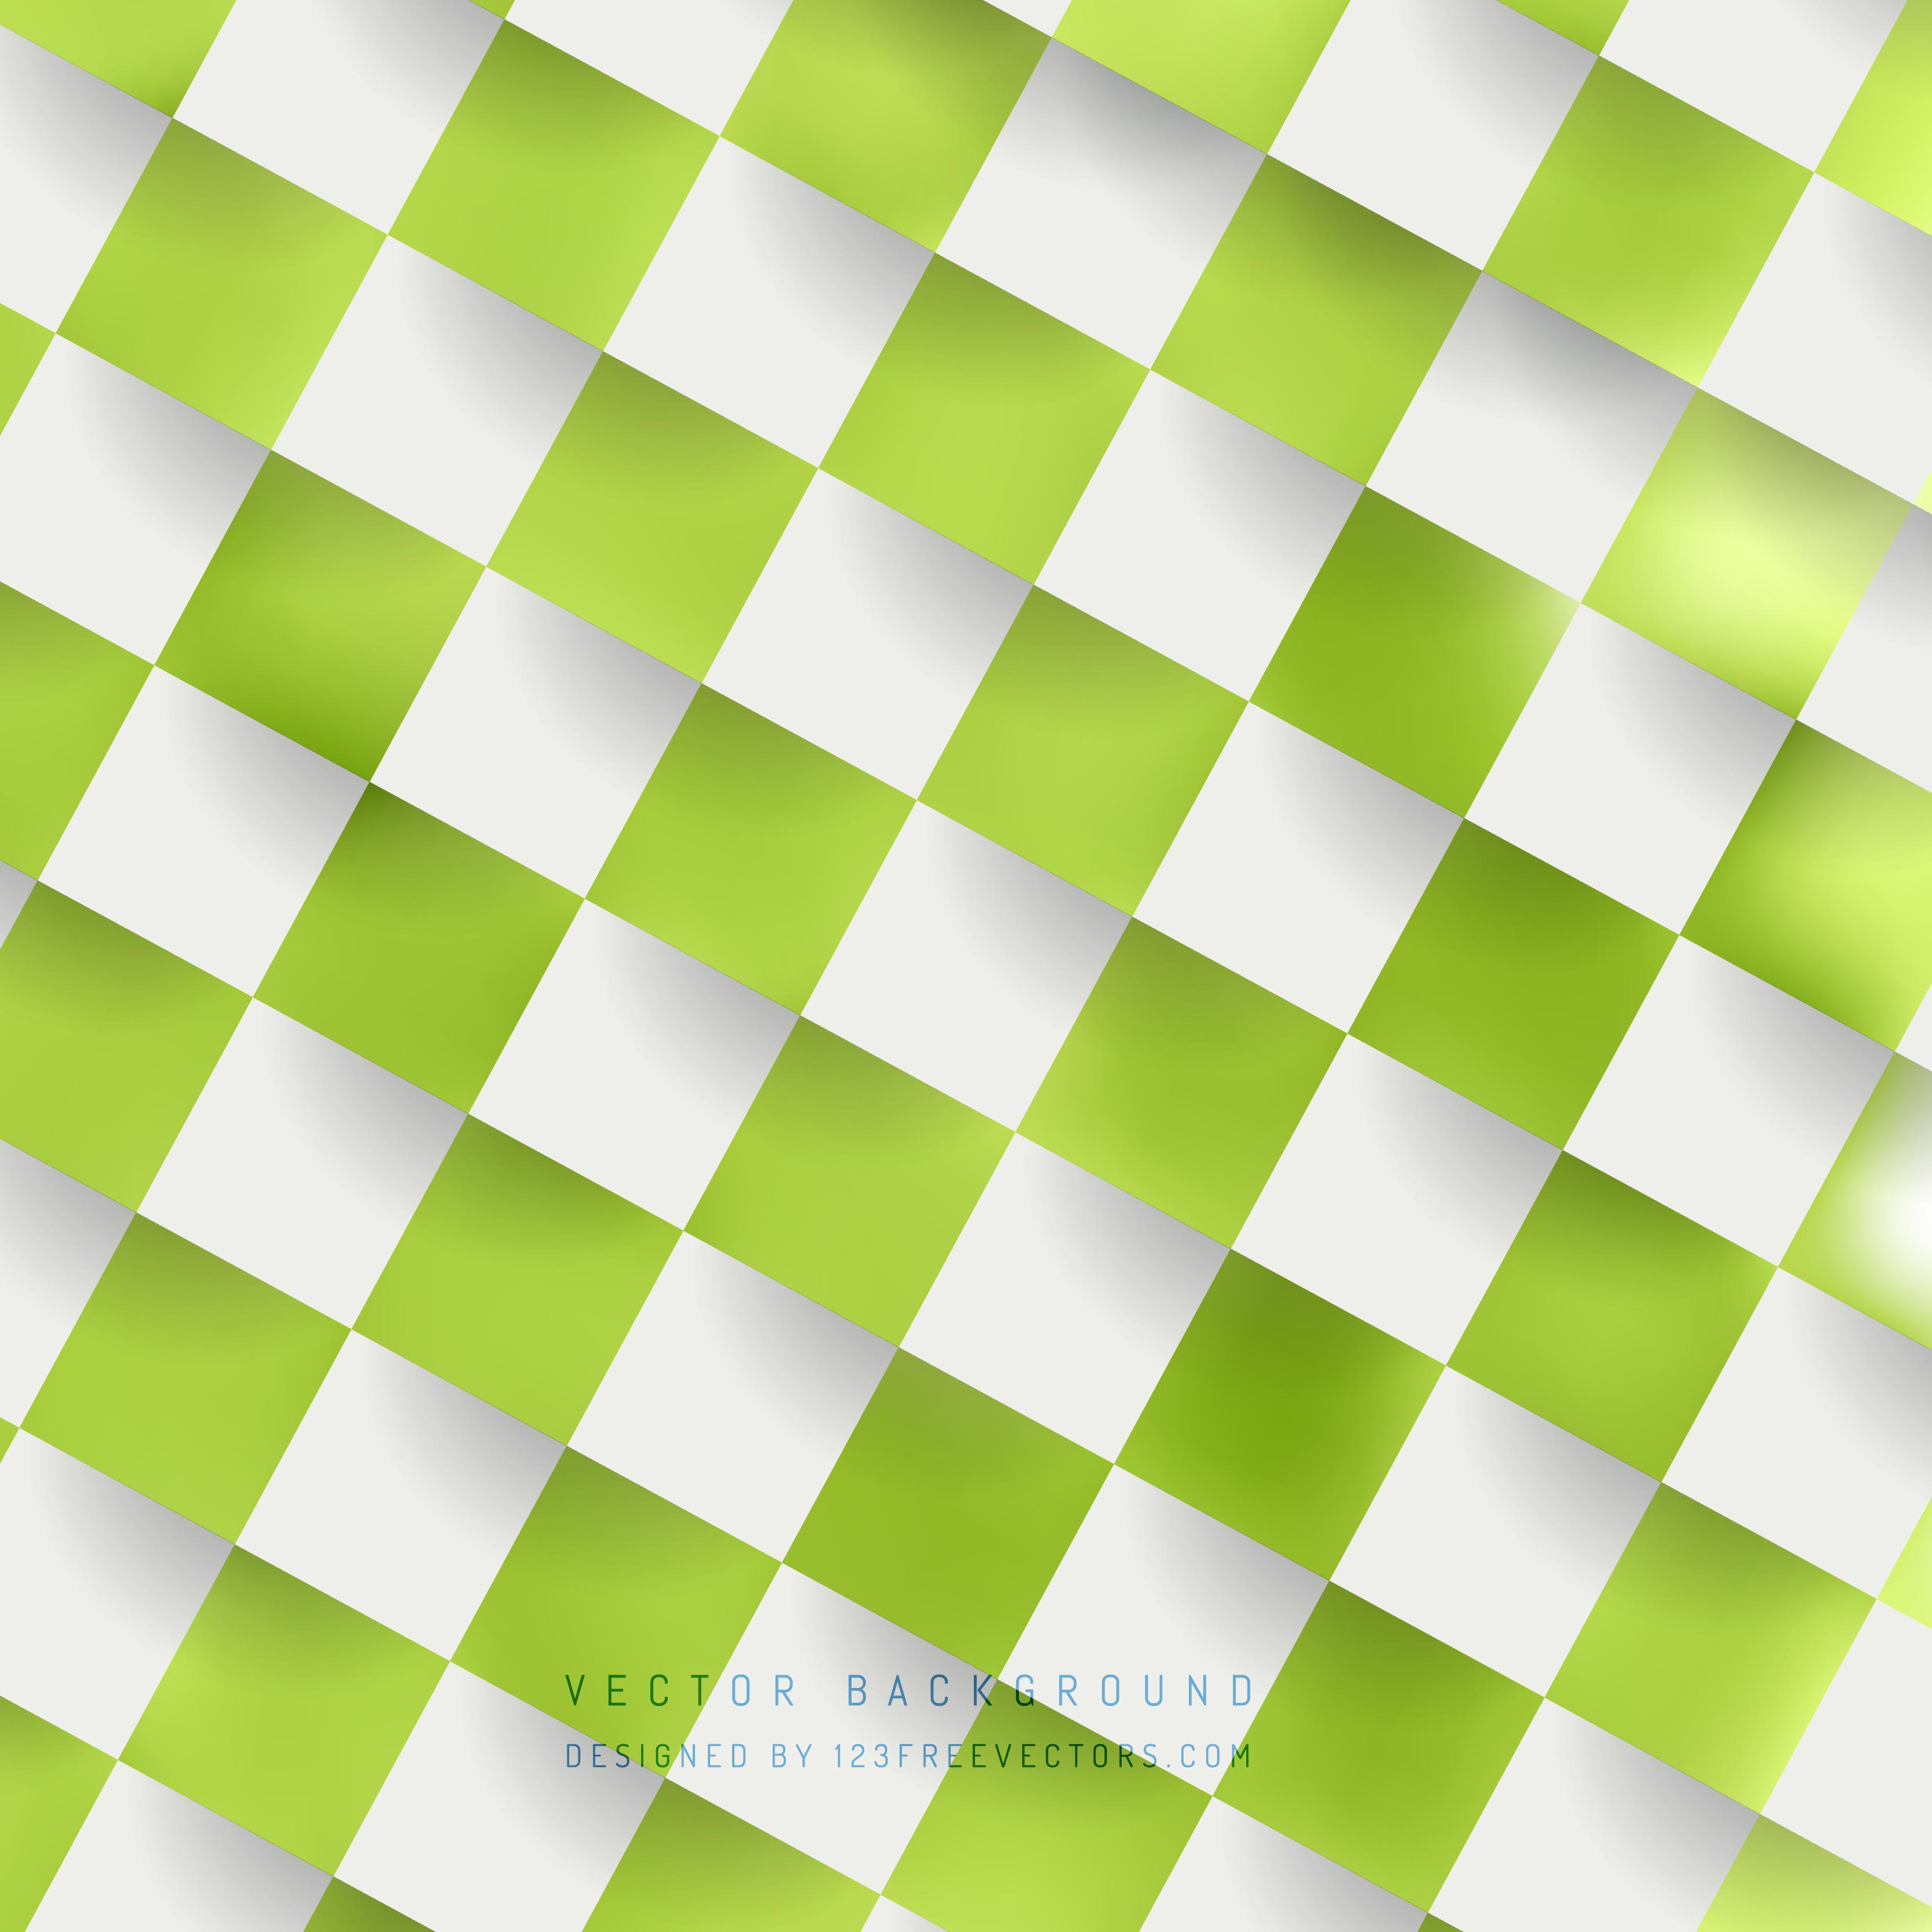 green checkerboard background clip art 123freevectors rh 123freevectors com Checkerboard Border checkerboard clipart free